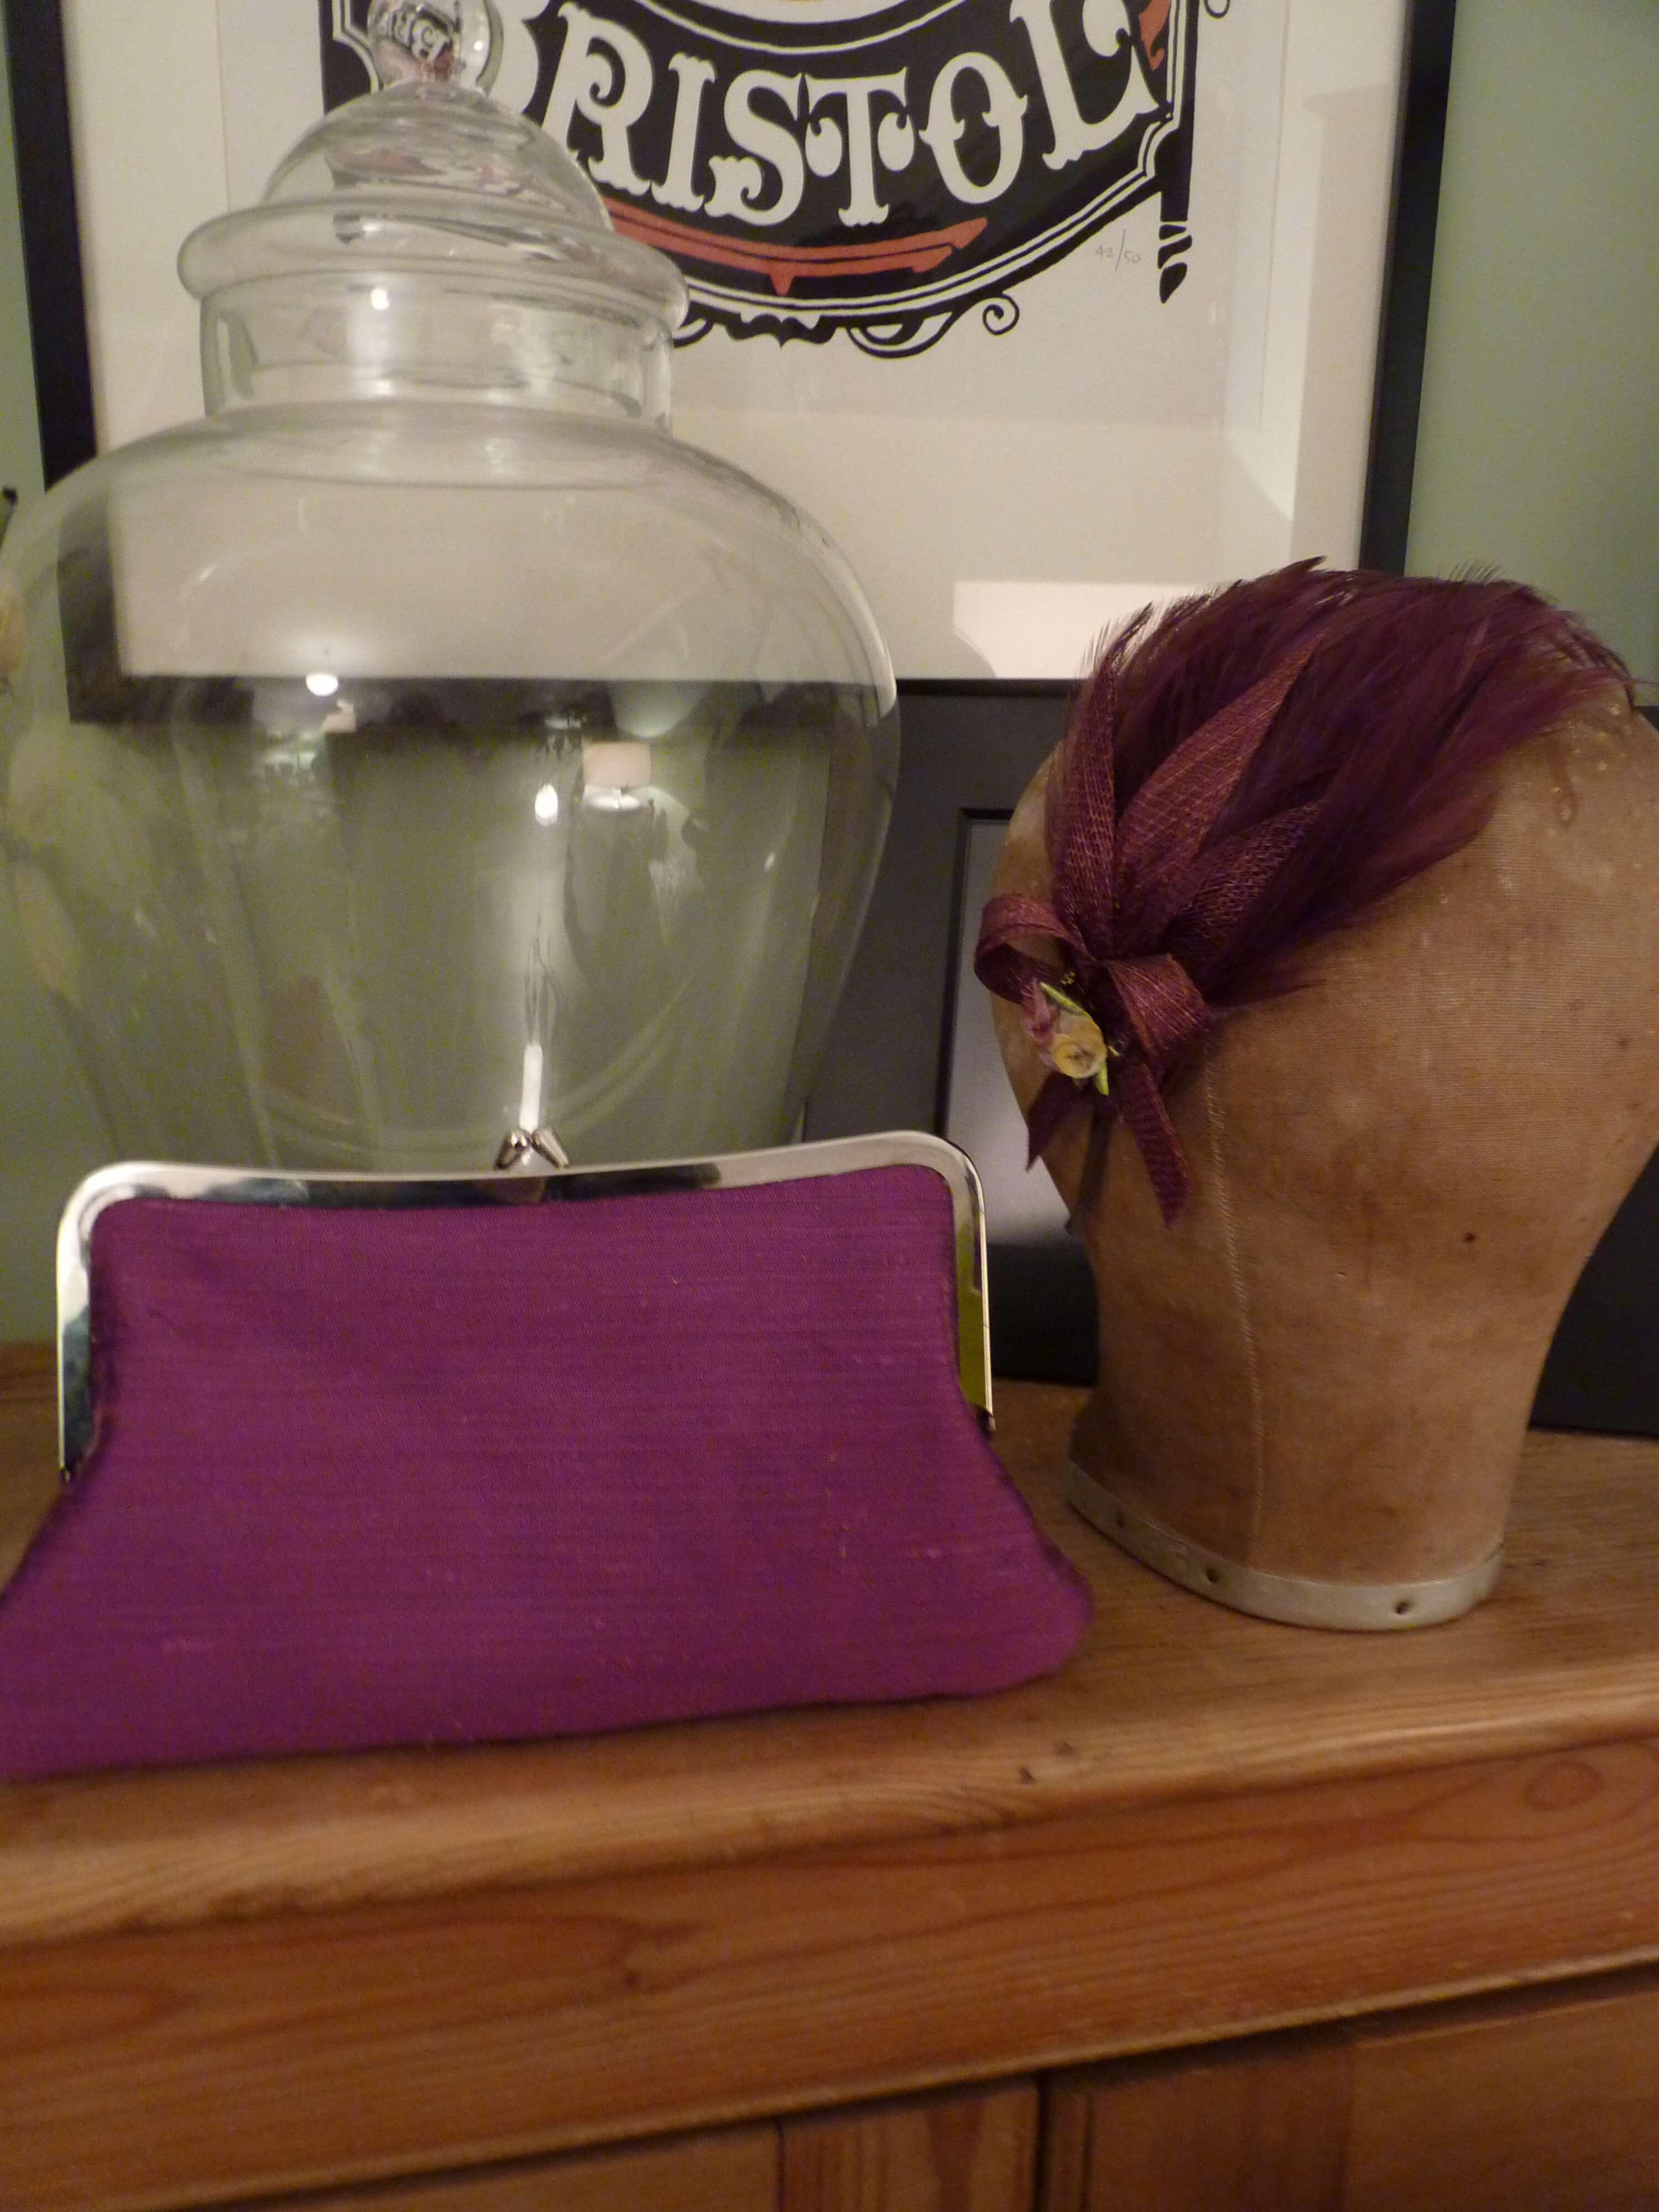 Bristol Clutch bag with matching bespoke hat.